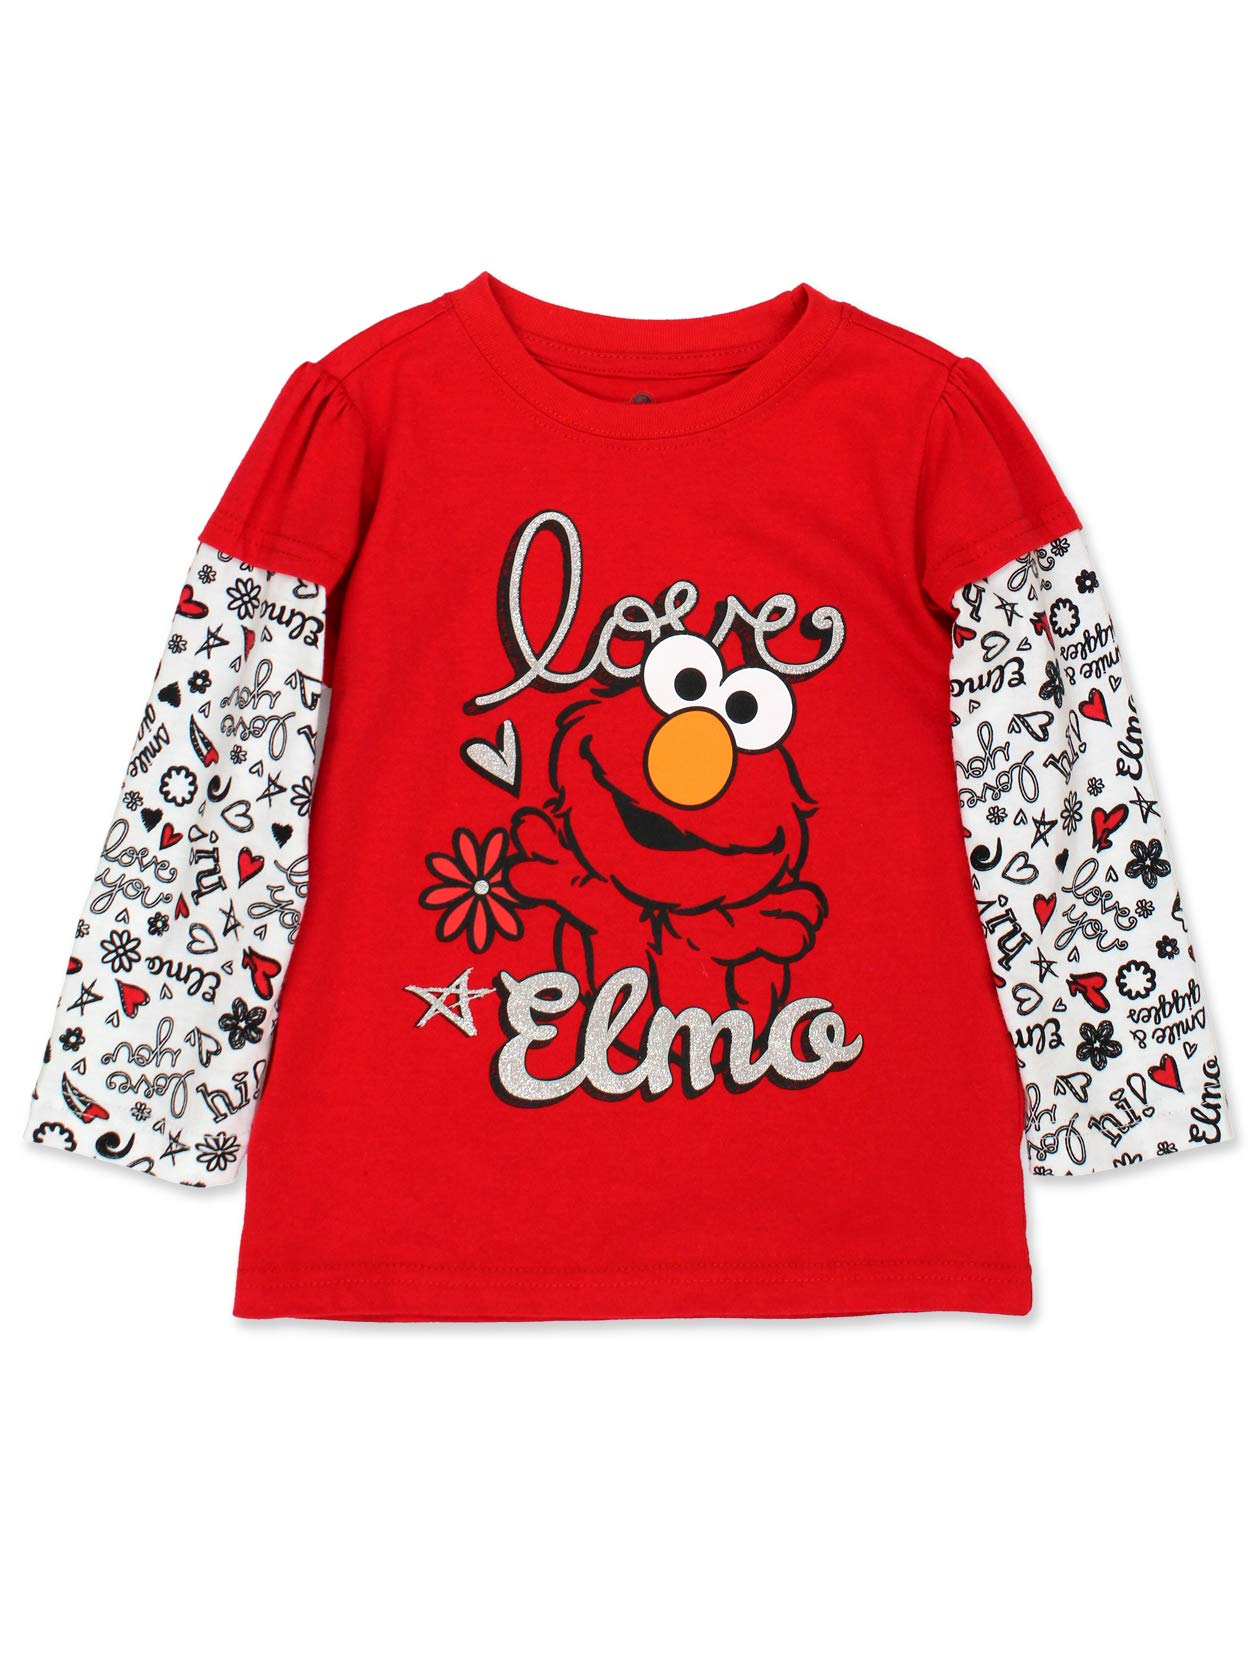 Sesame Street Elmo Girls Long Sleeve Tee (2T, Red) by Sesame Street